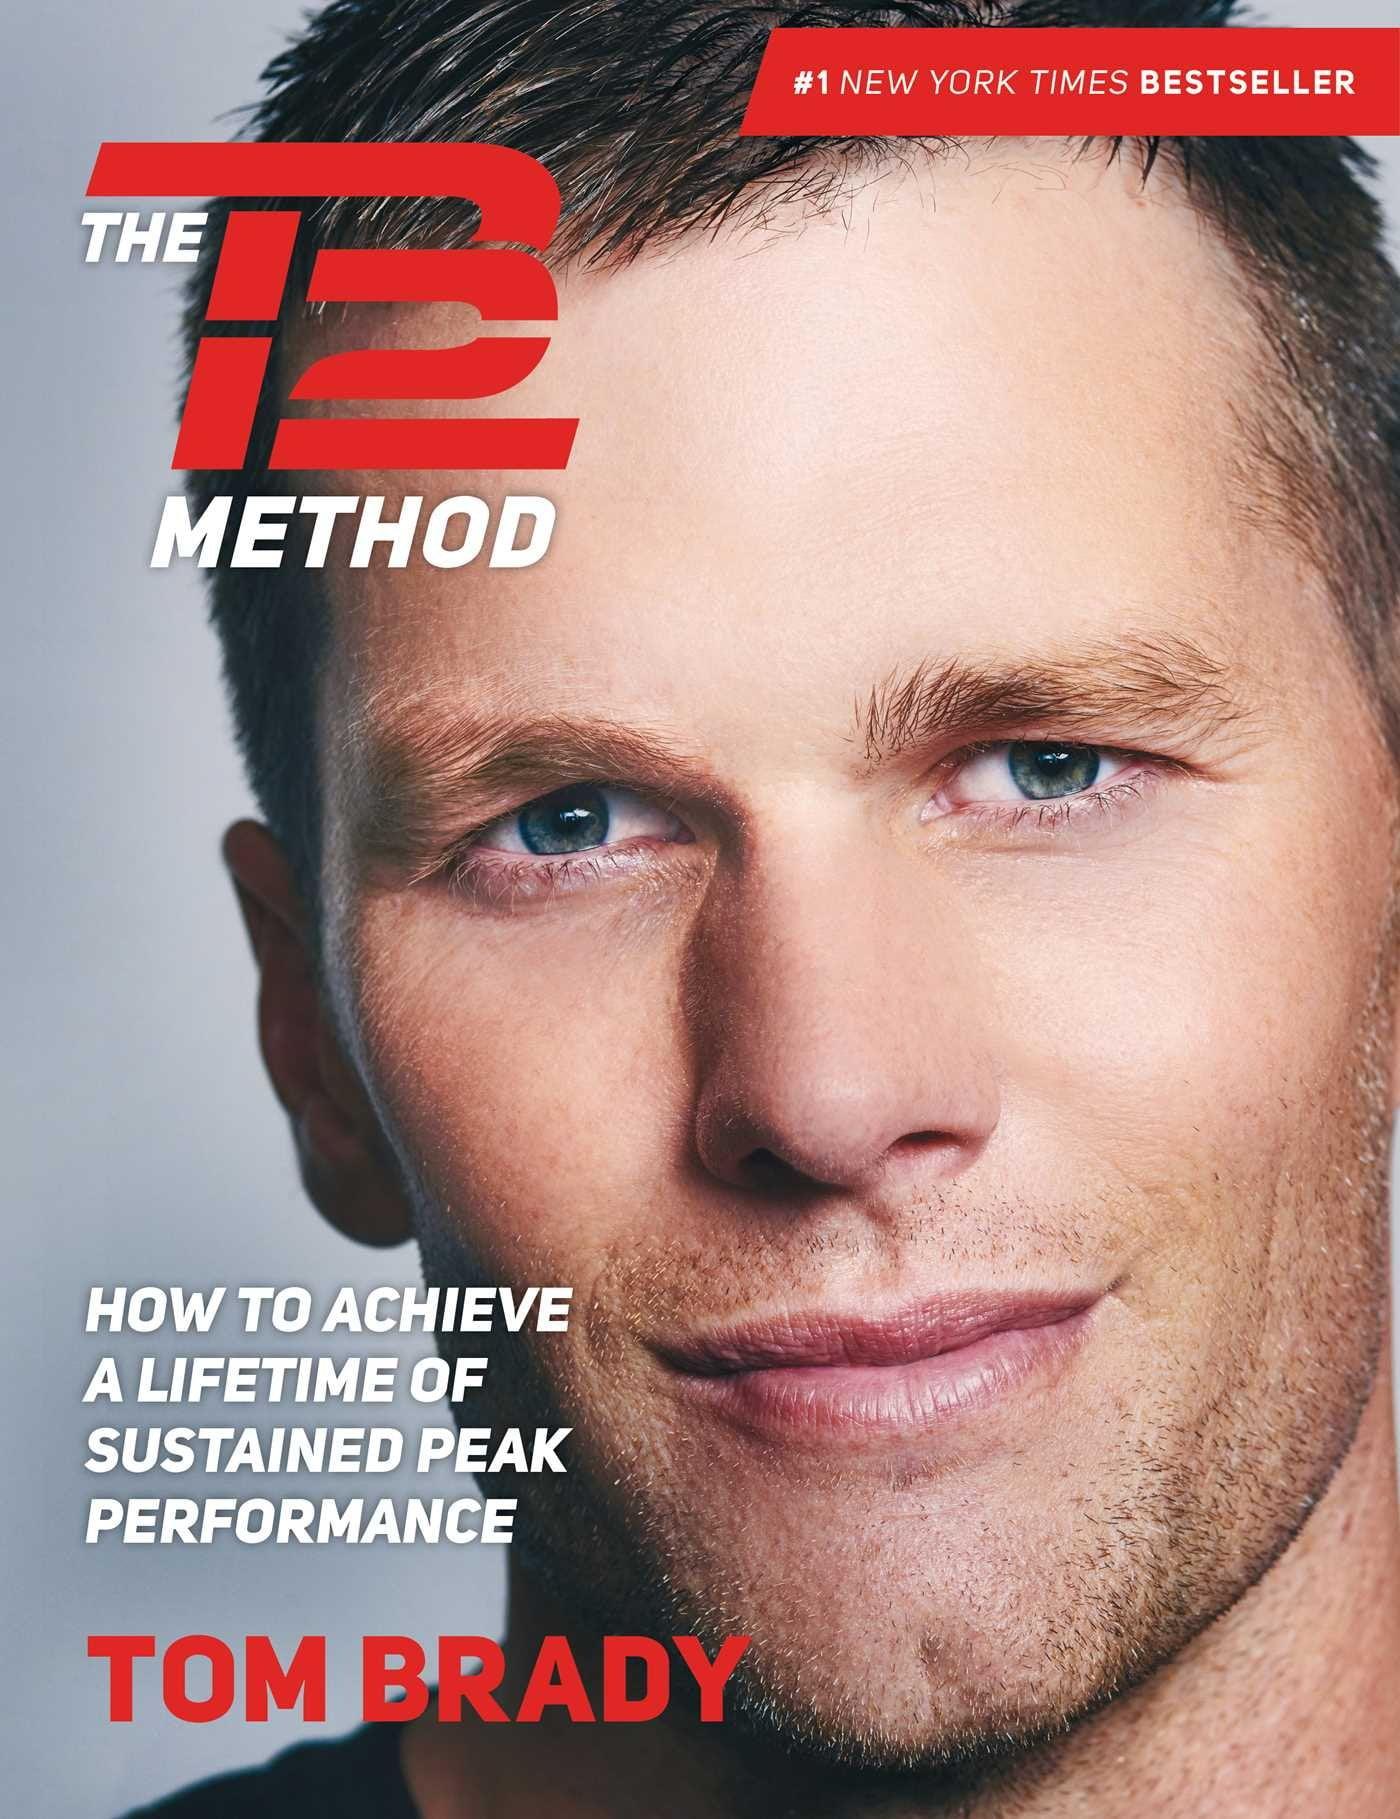 Tom Brady Net Worth and Key Habits - TB 12 Method